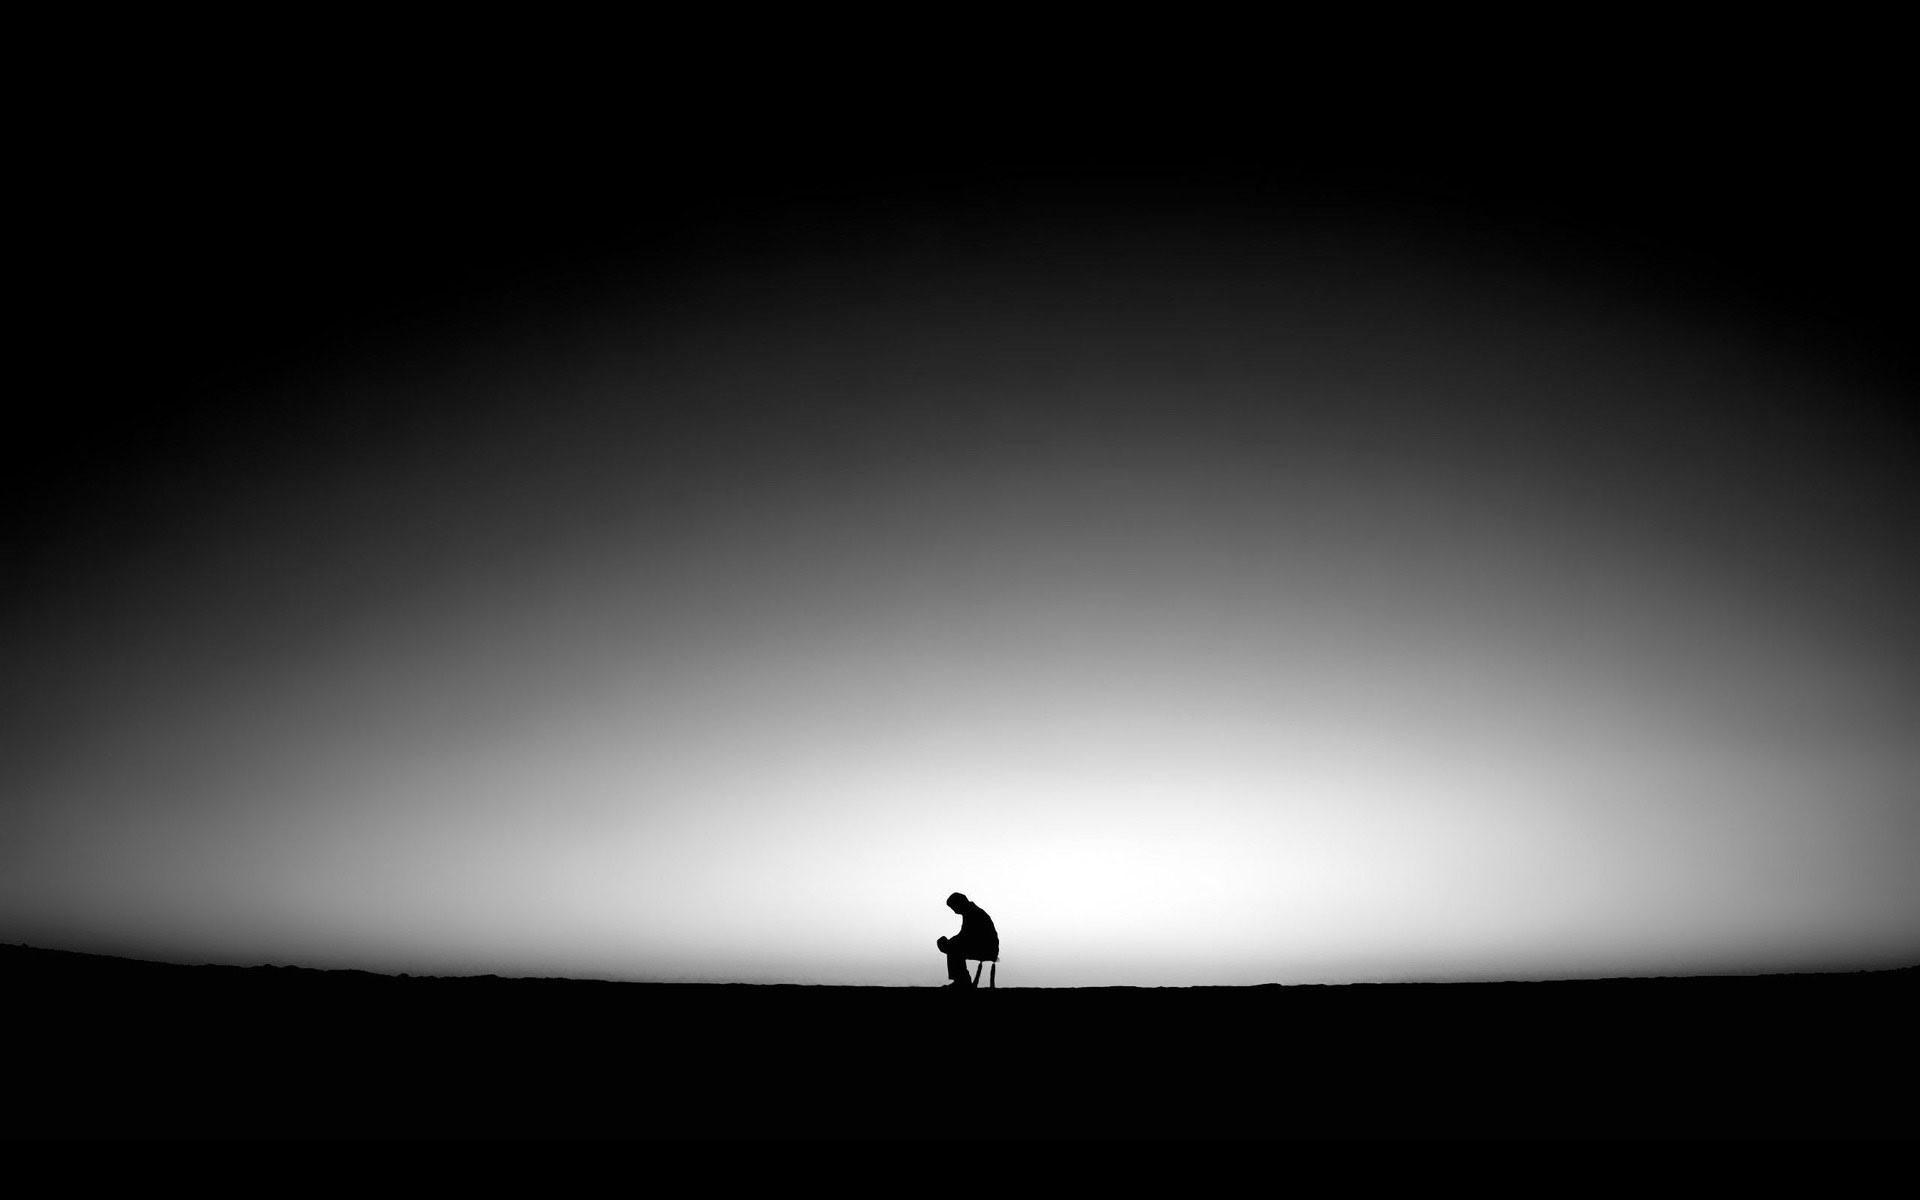 Aesthetic Profile Alone Broken Heart Sad Pictures